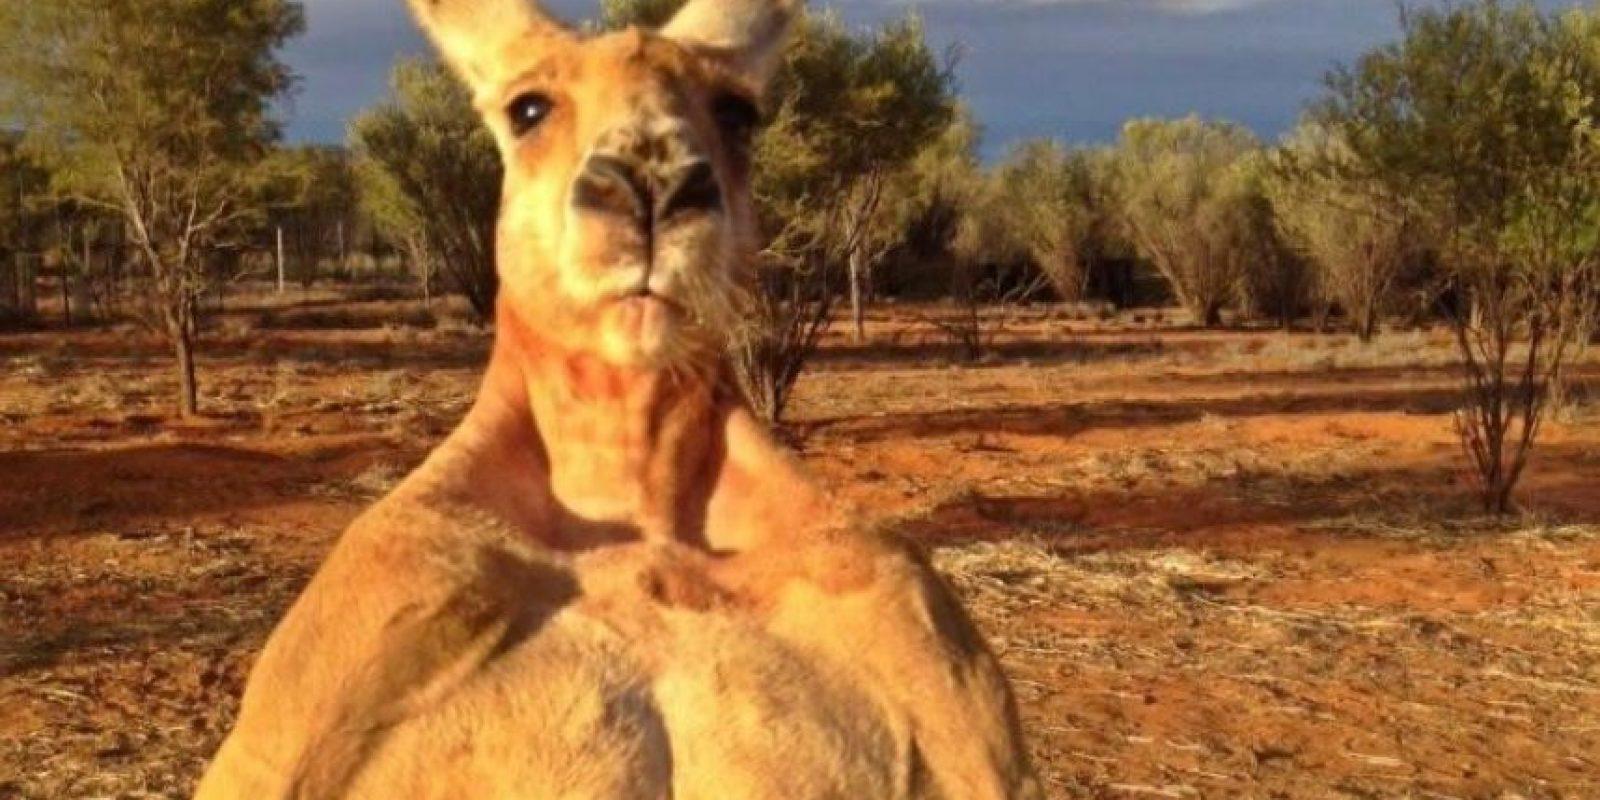 Mide 2.10 metros (6.9 pies) Foto:Vía Facebook.com/kangaroosanctuary